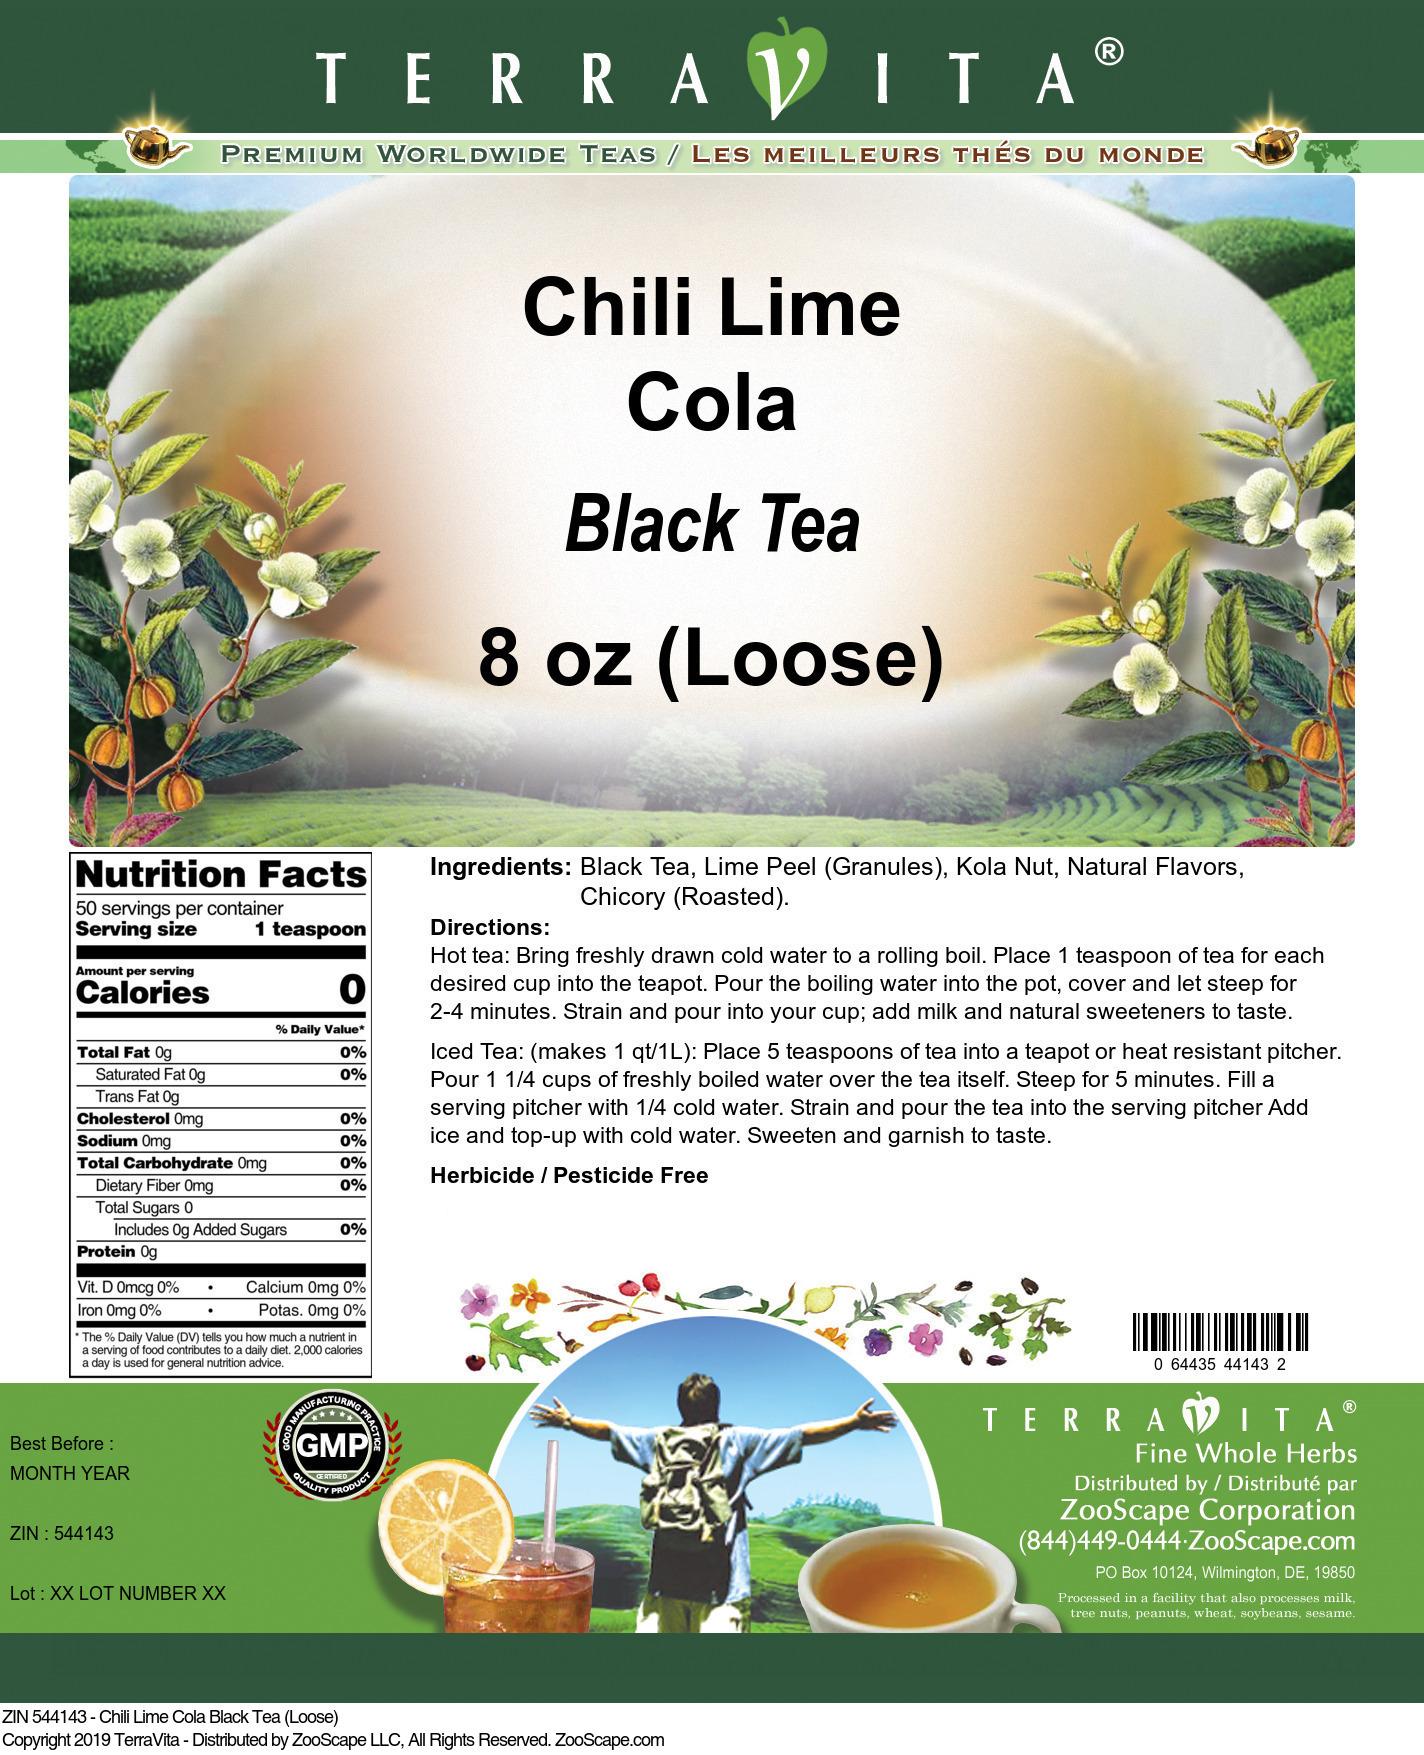 Chili Lime Cola Black Tea